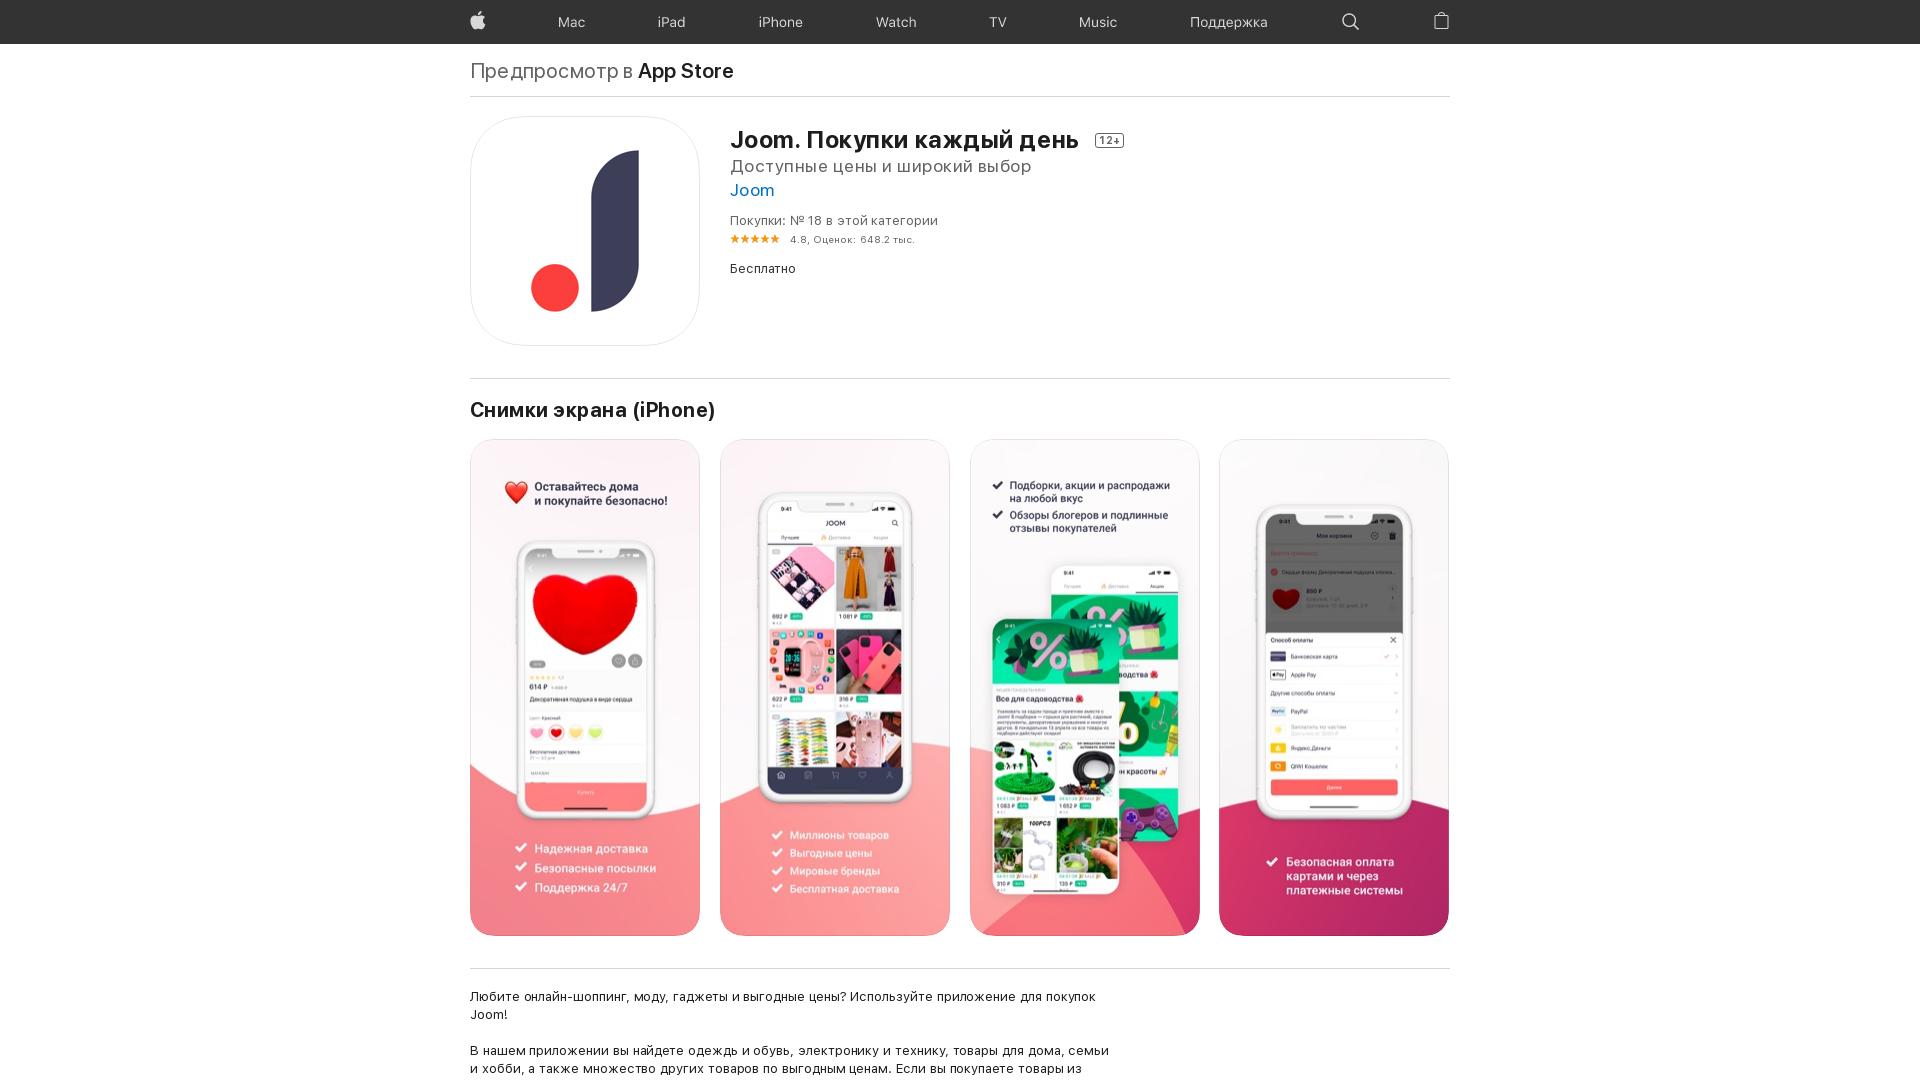 Joom [CPS, iOS] Many GEOs website